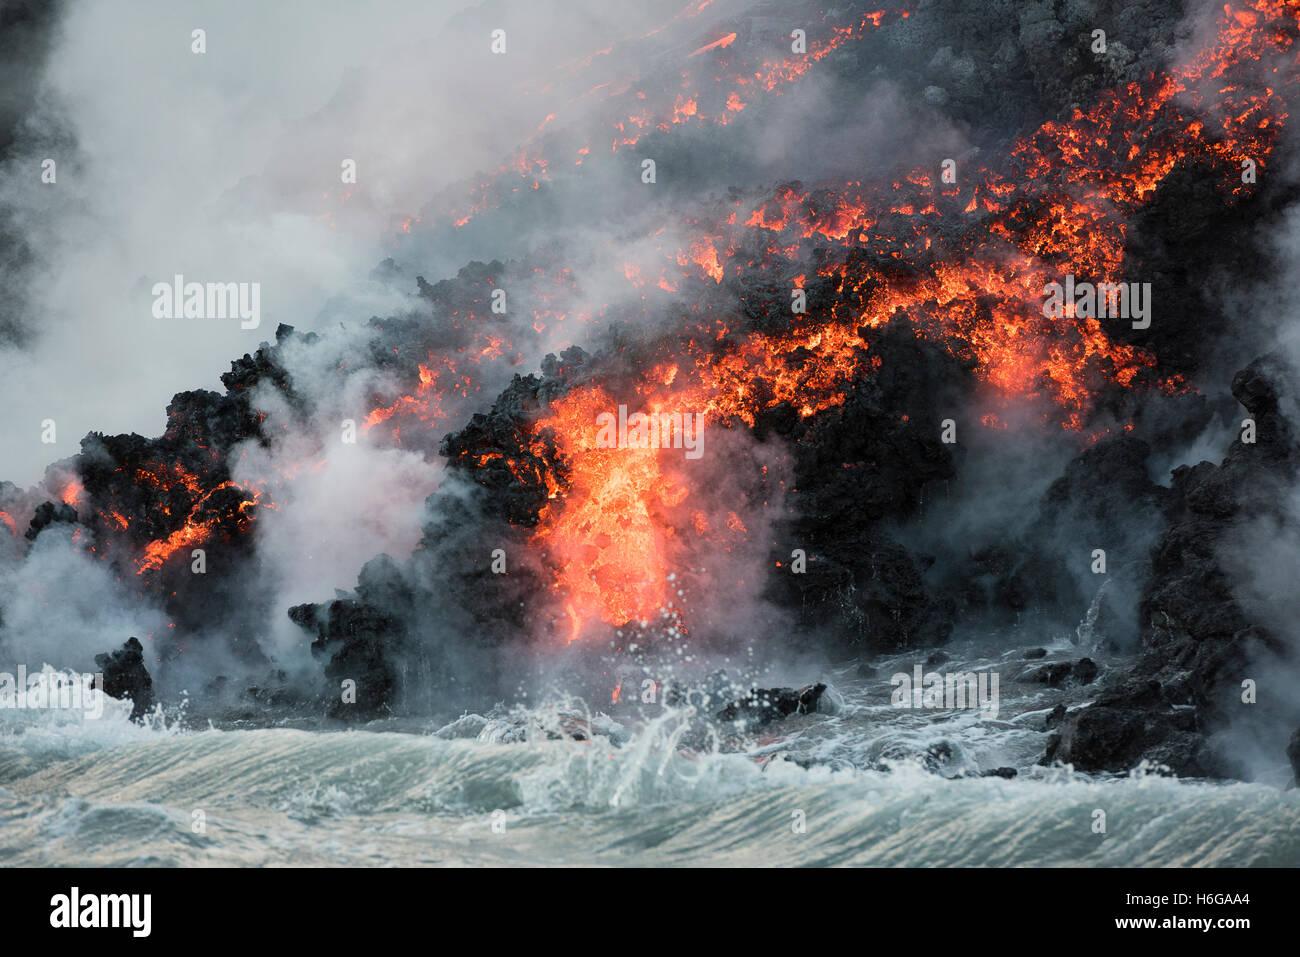 Hot a ' a Lava von Kilauea-Vulkan, erreicht das Meer bei Kamokuna, Kalapana, Hawaii Volcanoes National Park Stockbild